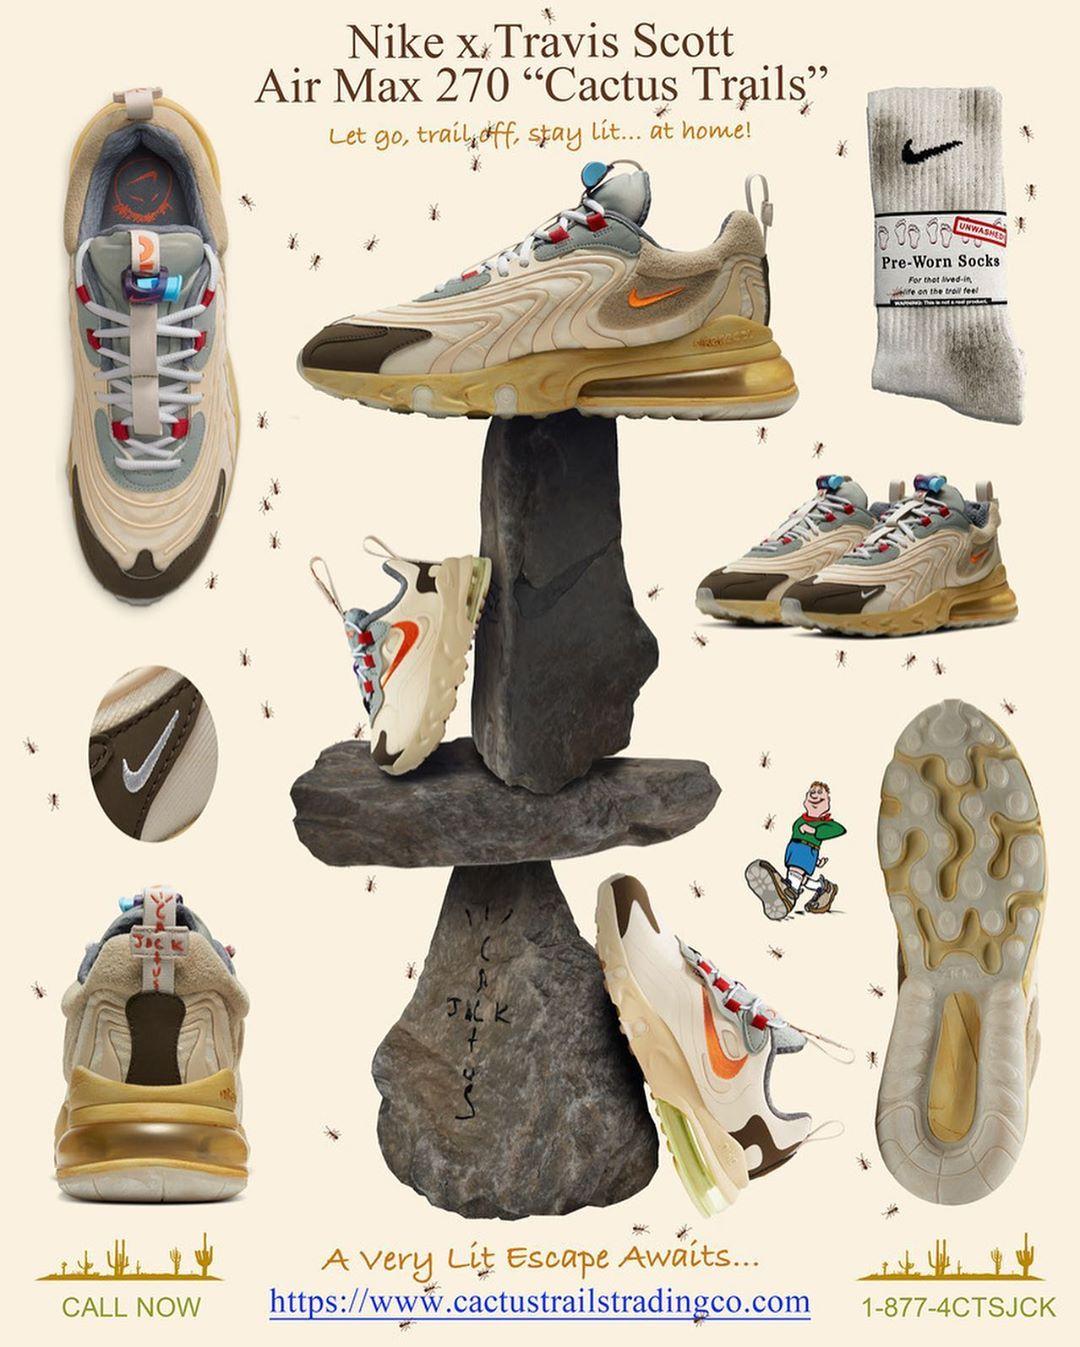 Travis Scott,Nike,Air Max 270  國內近 30 家店鋪即將登記!TS x Nike 新聯名特殊包裝曝光!